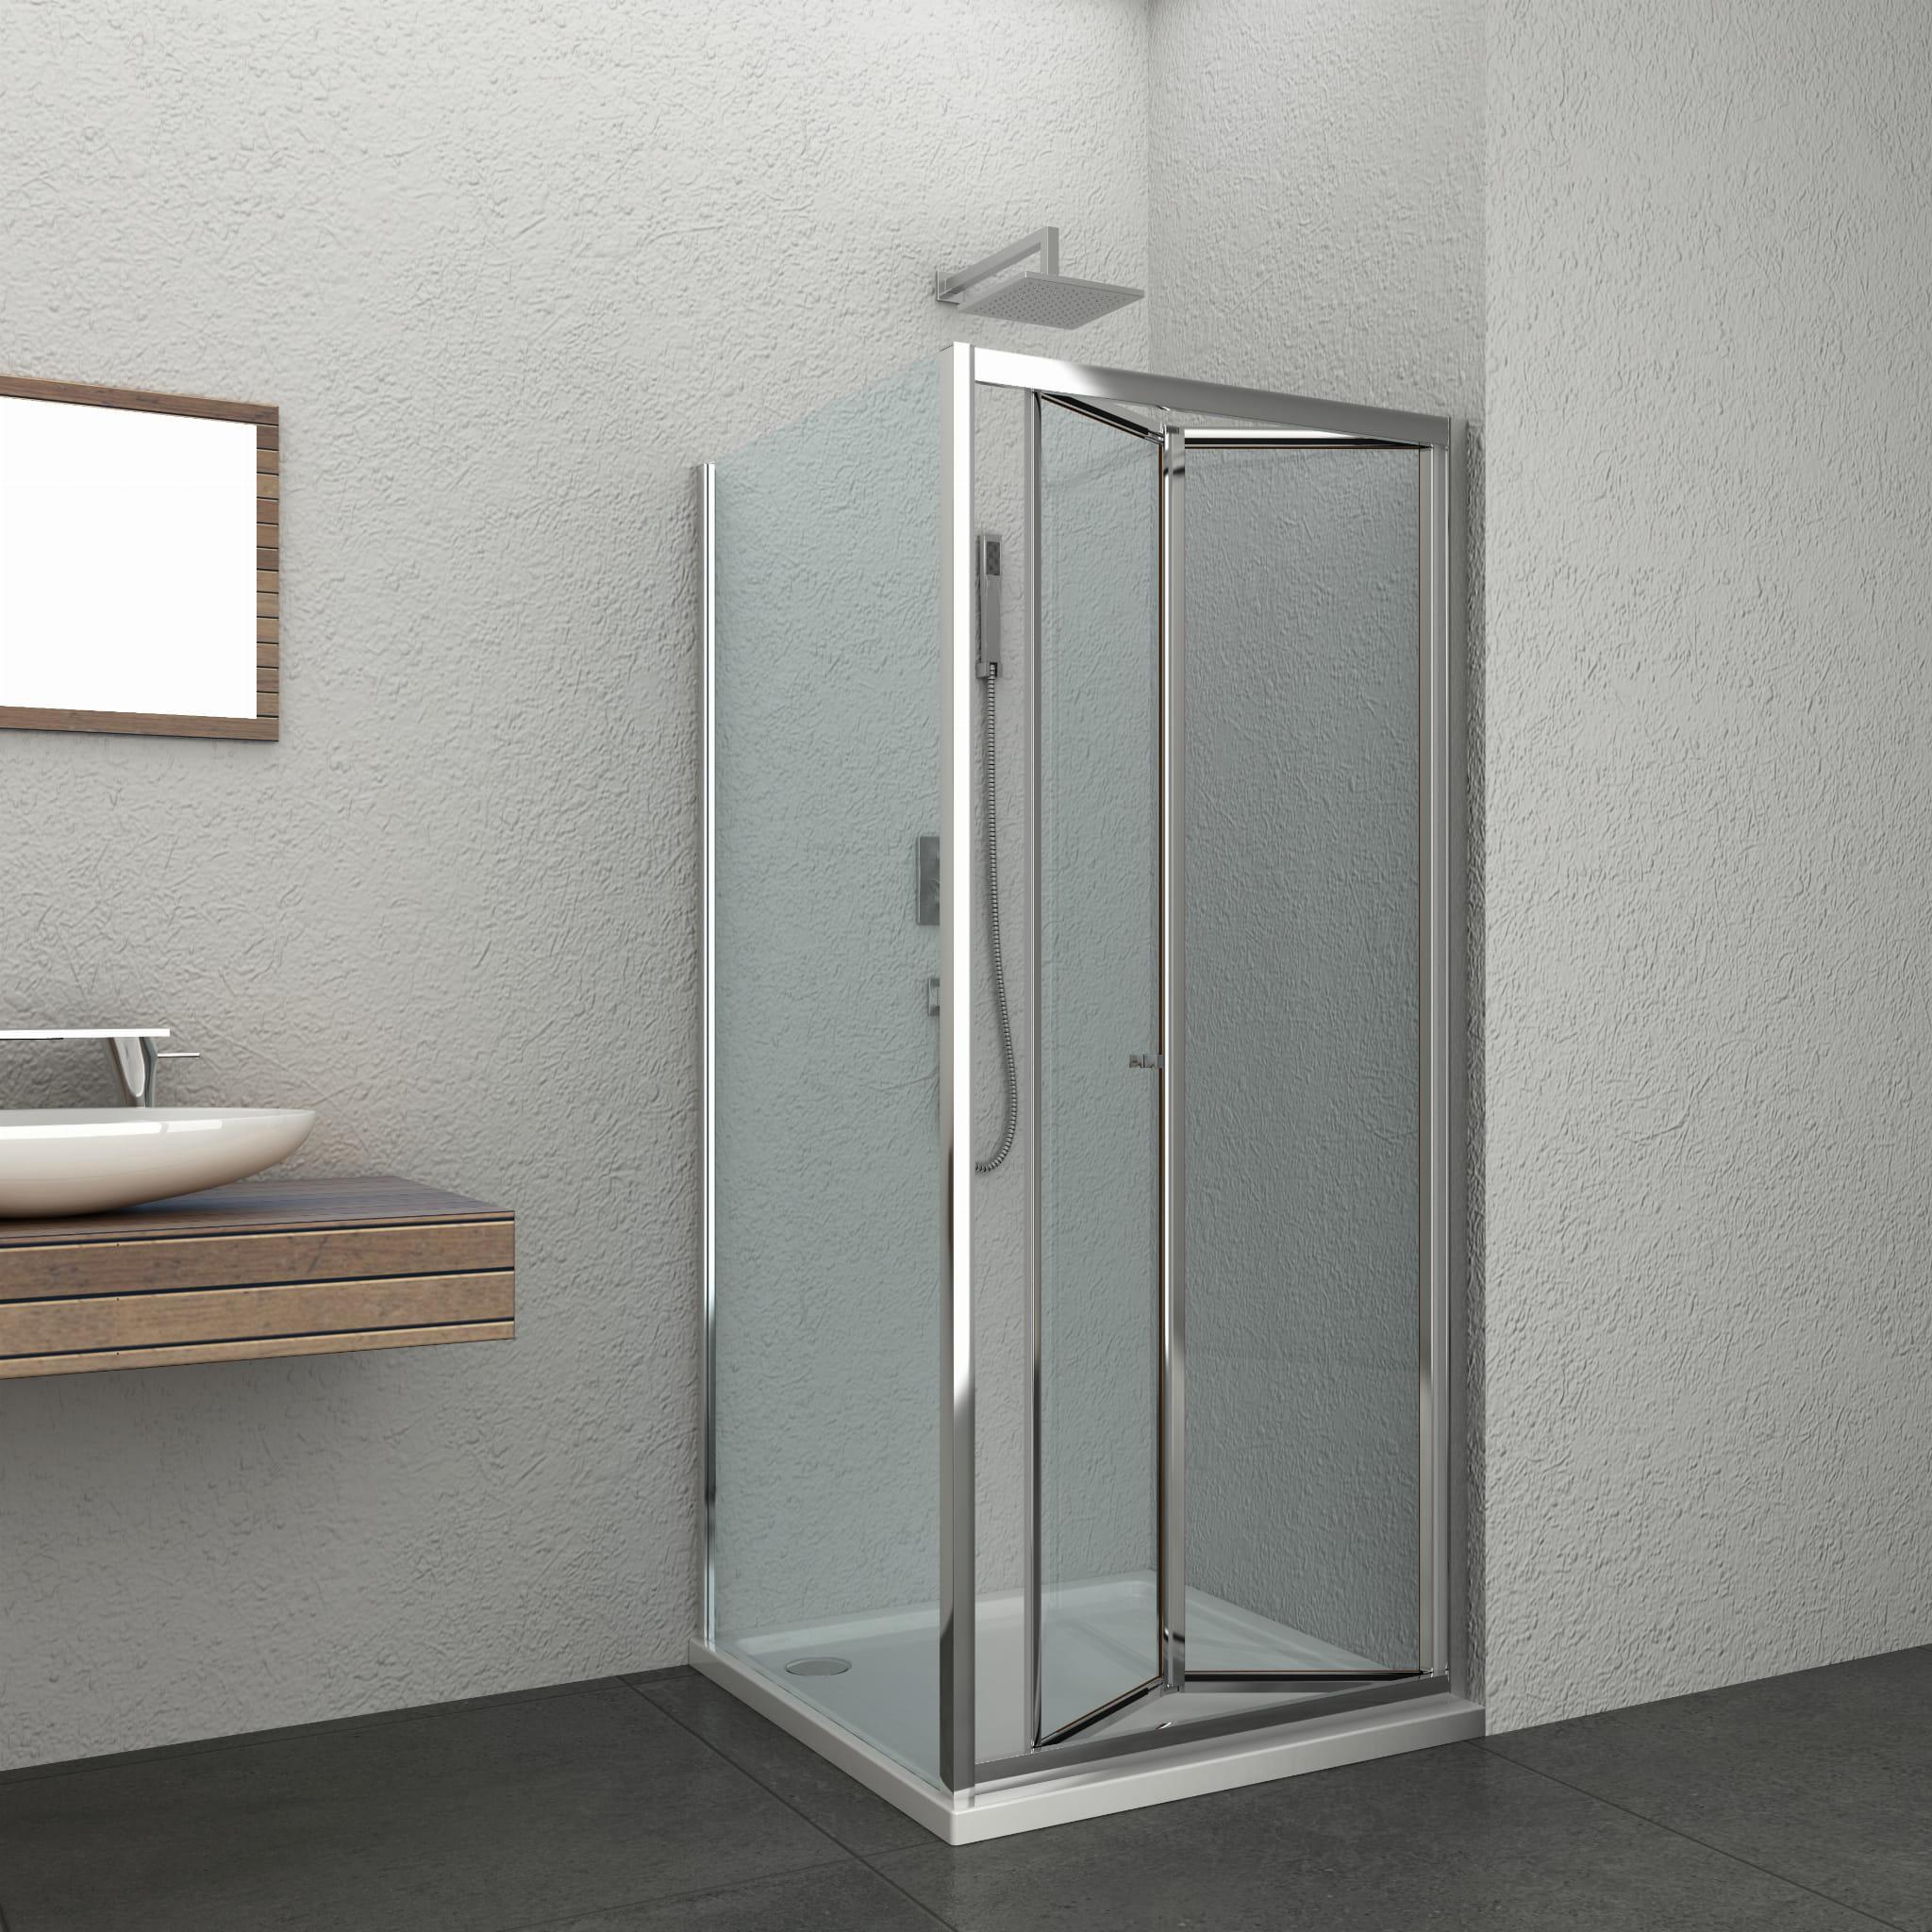 Sanotechnik - Sprchovací kút ELITE CHROME - hranatý, výklopné dvere 90 x 90 x 195 cm